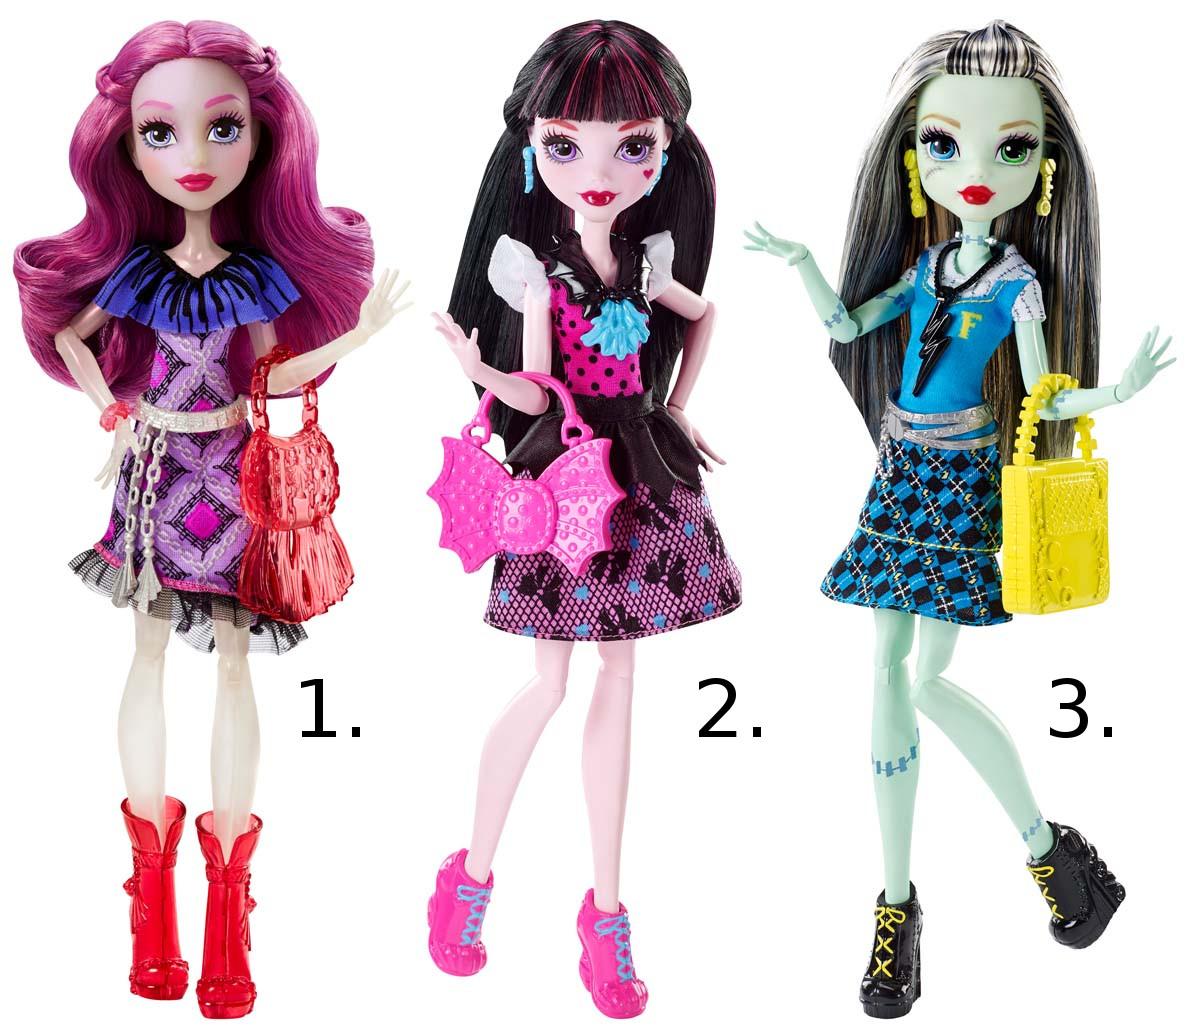 Главные персонажи из серии Monster High в модных нарядахКуклы Ever After High и Monster High<br>Главные персонажи из серии Monster High в модных нарядах<br>